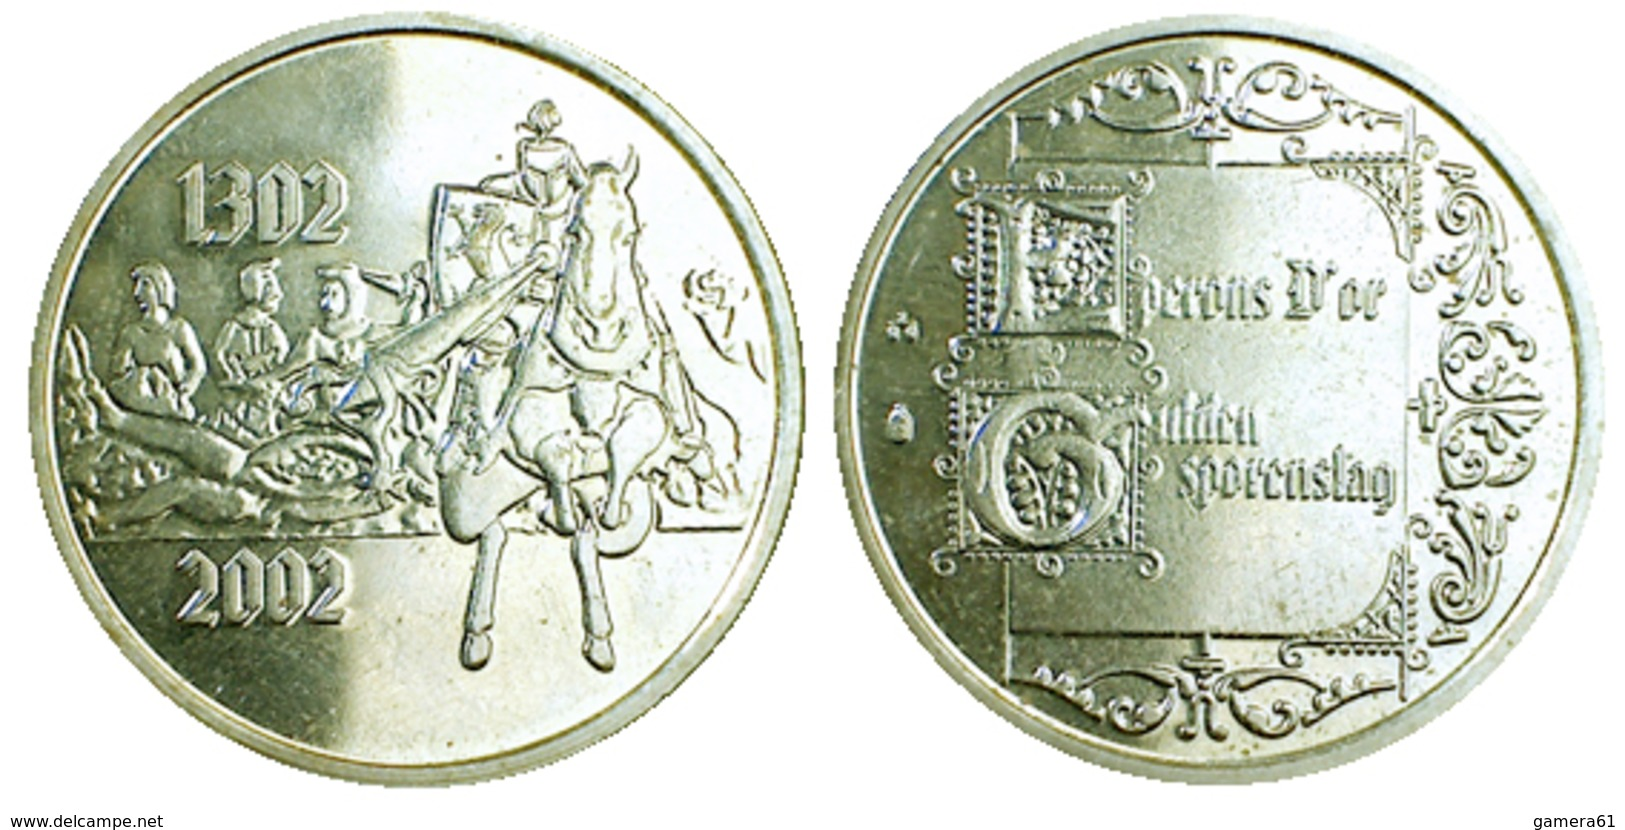 01496 GETTONE TOKEN JETON BELGIUM FICHA COMMEMORATIVE EPERONS D'OR 2002 - Pays-Bas